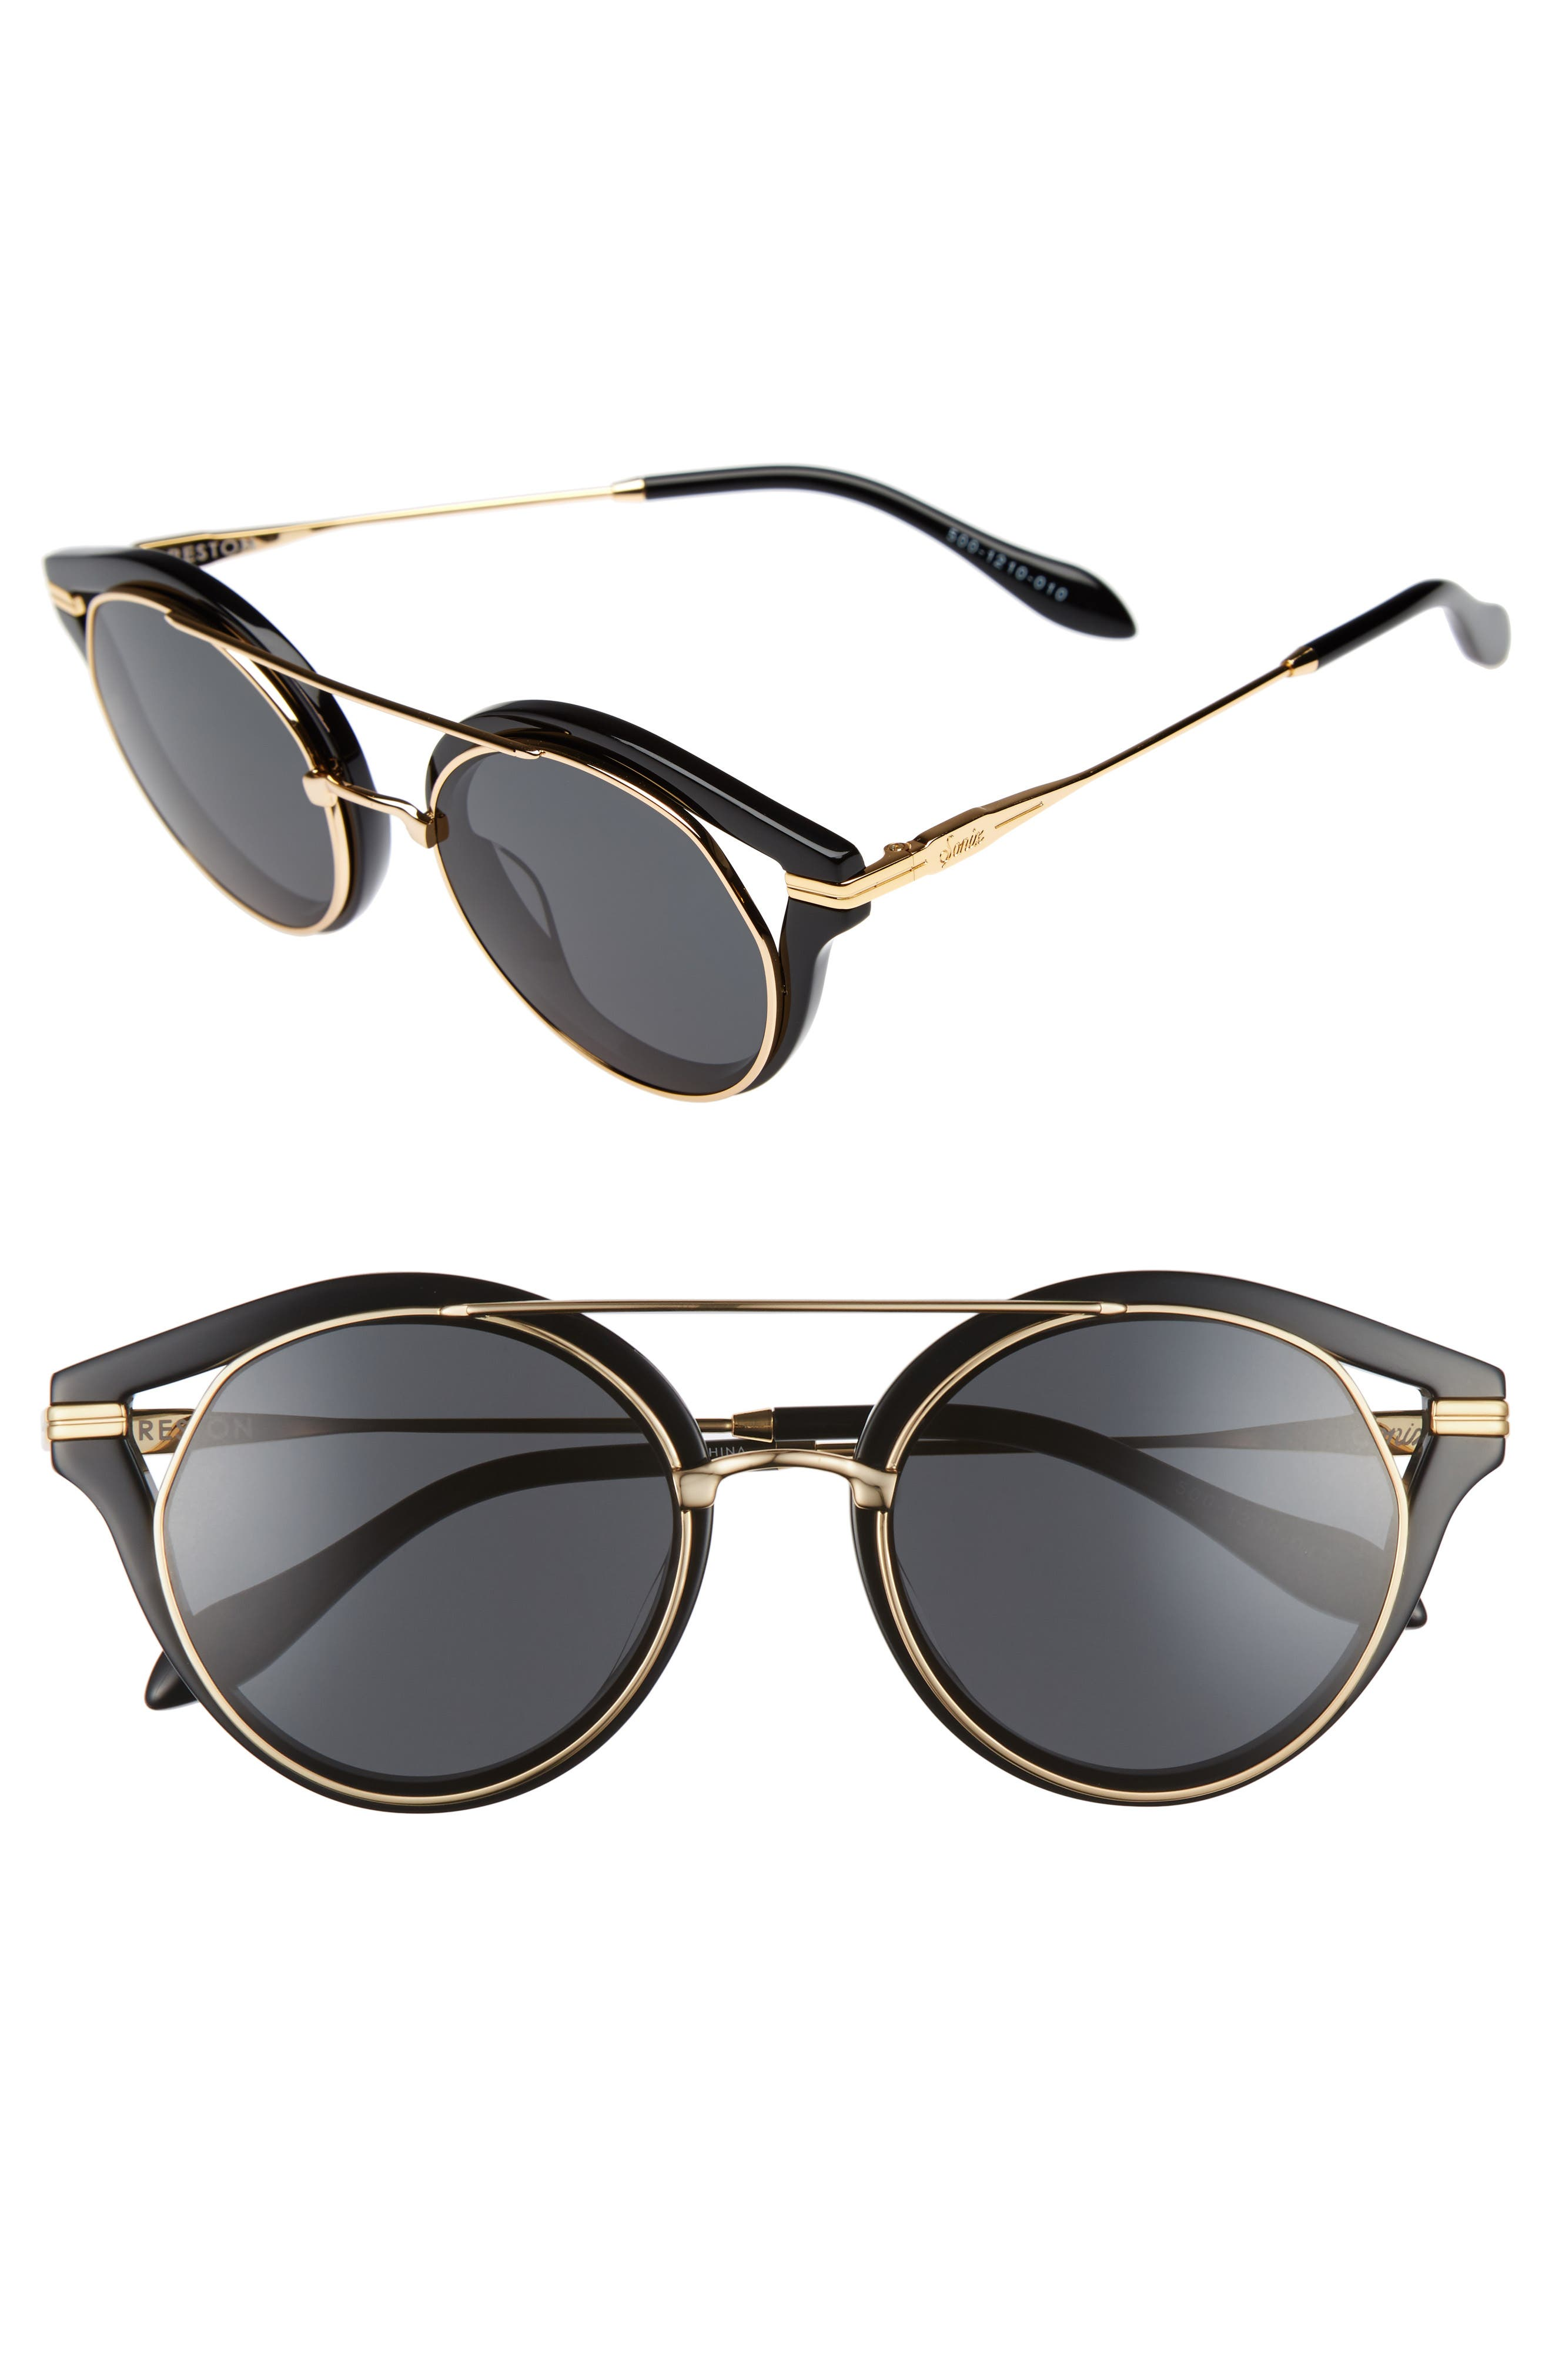 Main Image - Sonix Preston 51mm Gradient Round Sunglasses